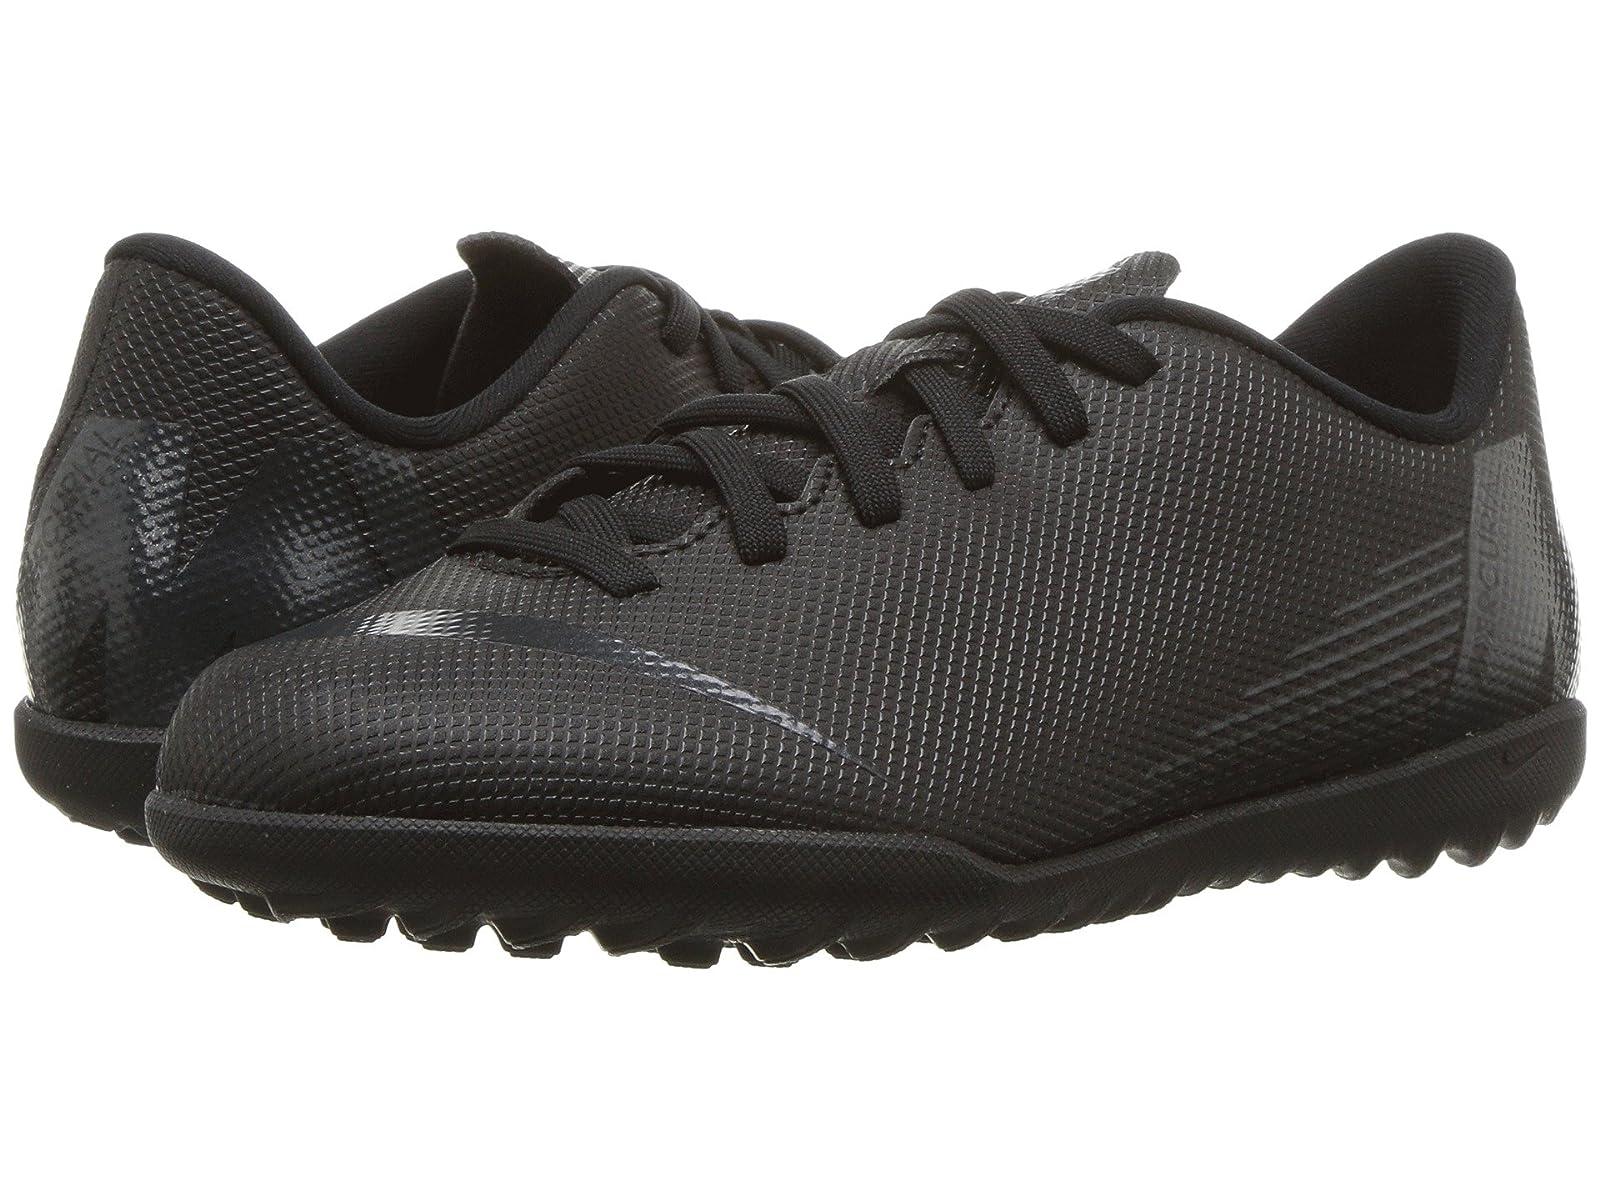 Nike Kids VaporX 12 Club TF Soccer (Toddler/Little Kid/Big Kid)Atmospheric grades have affordable shoes